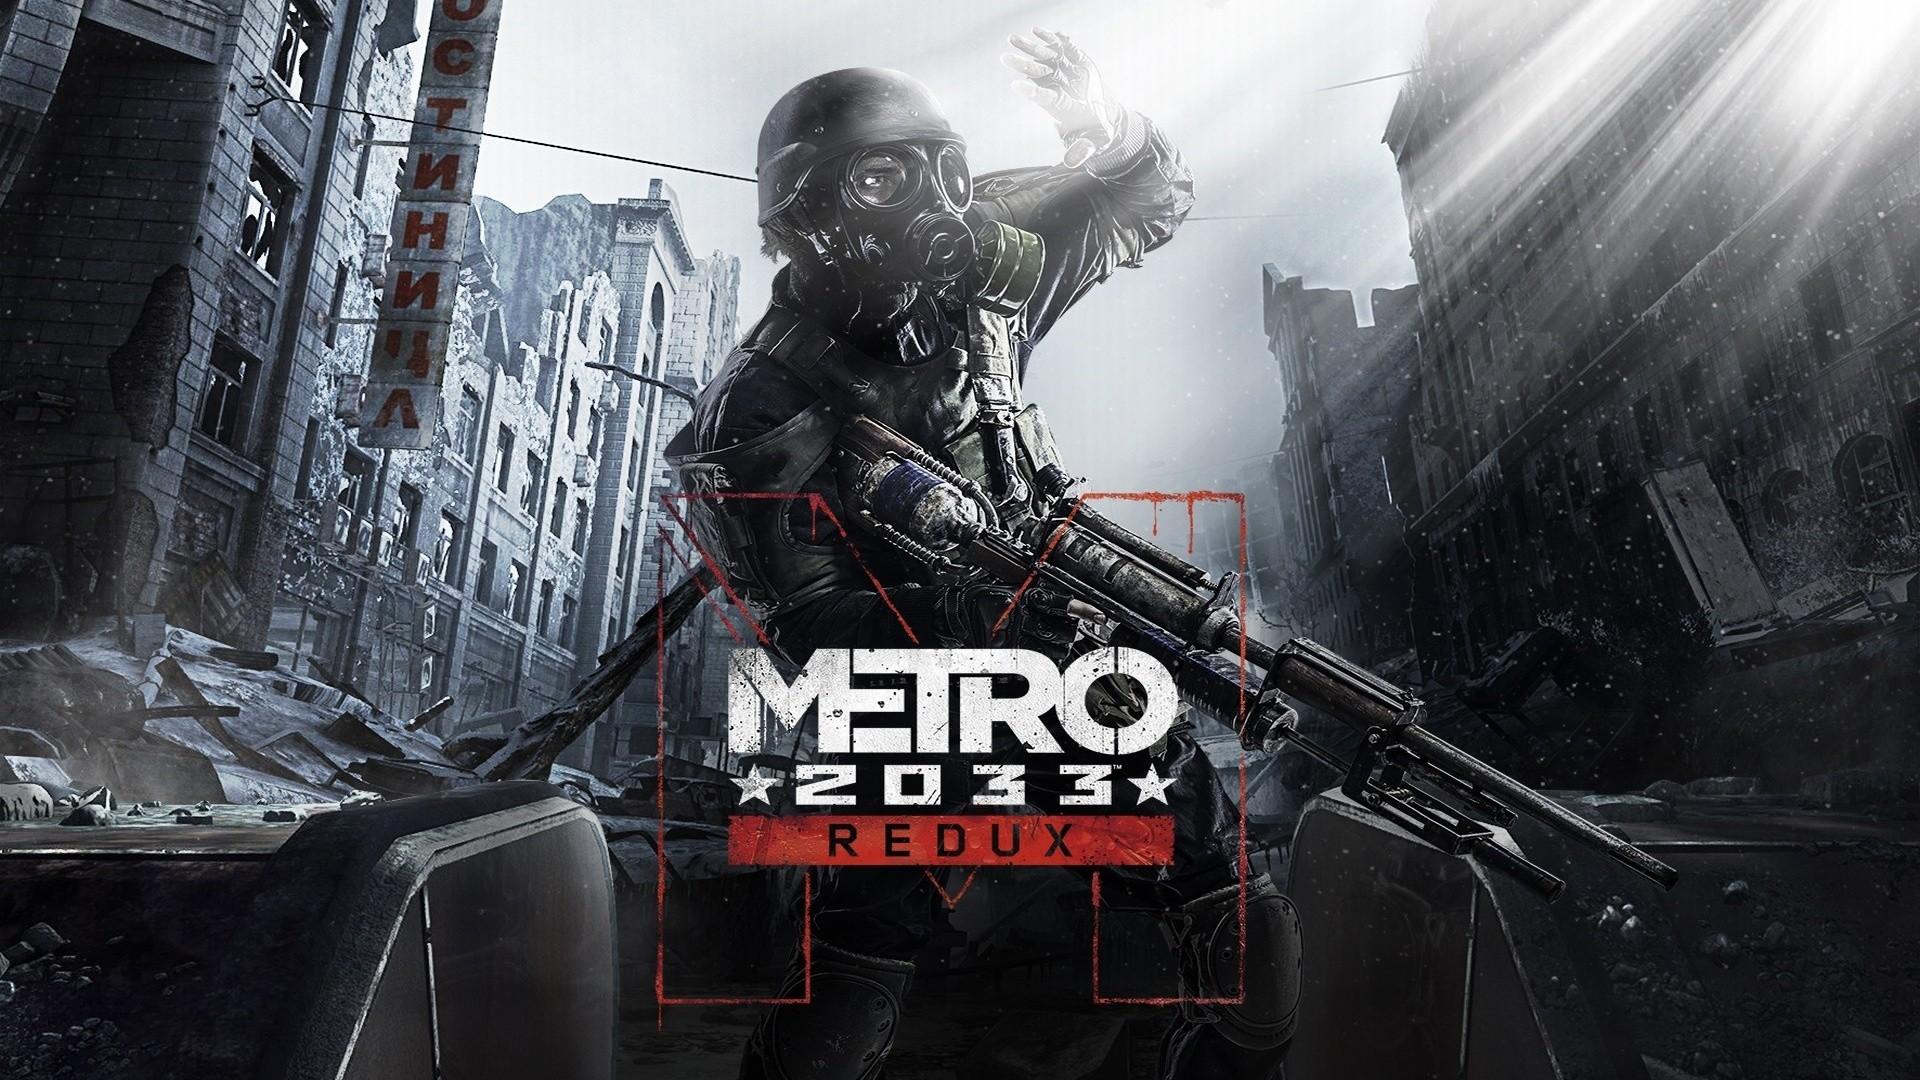 Metro 2033 Wallpaper 1920x1080 80 Images